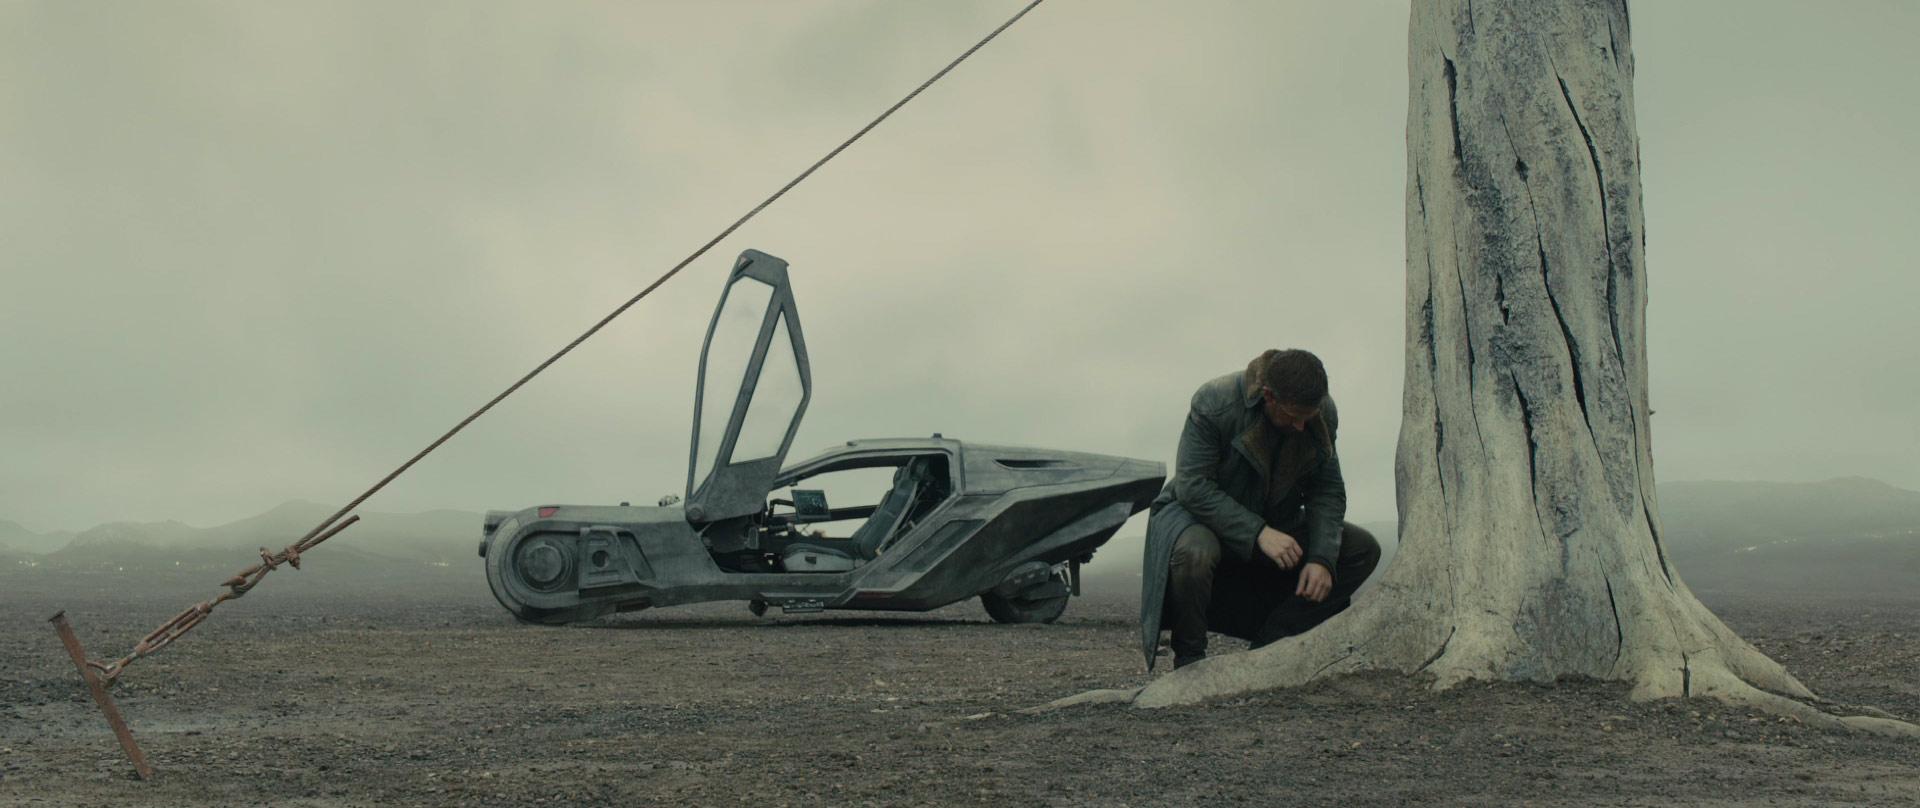 Blade Runner 2049 Tr 036